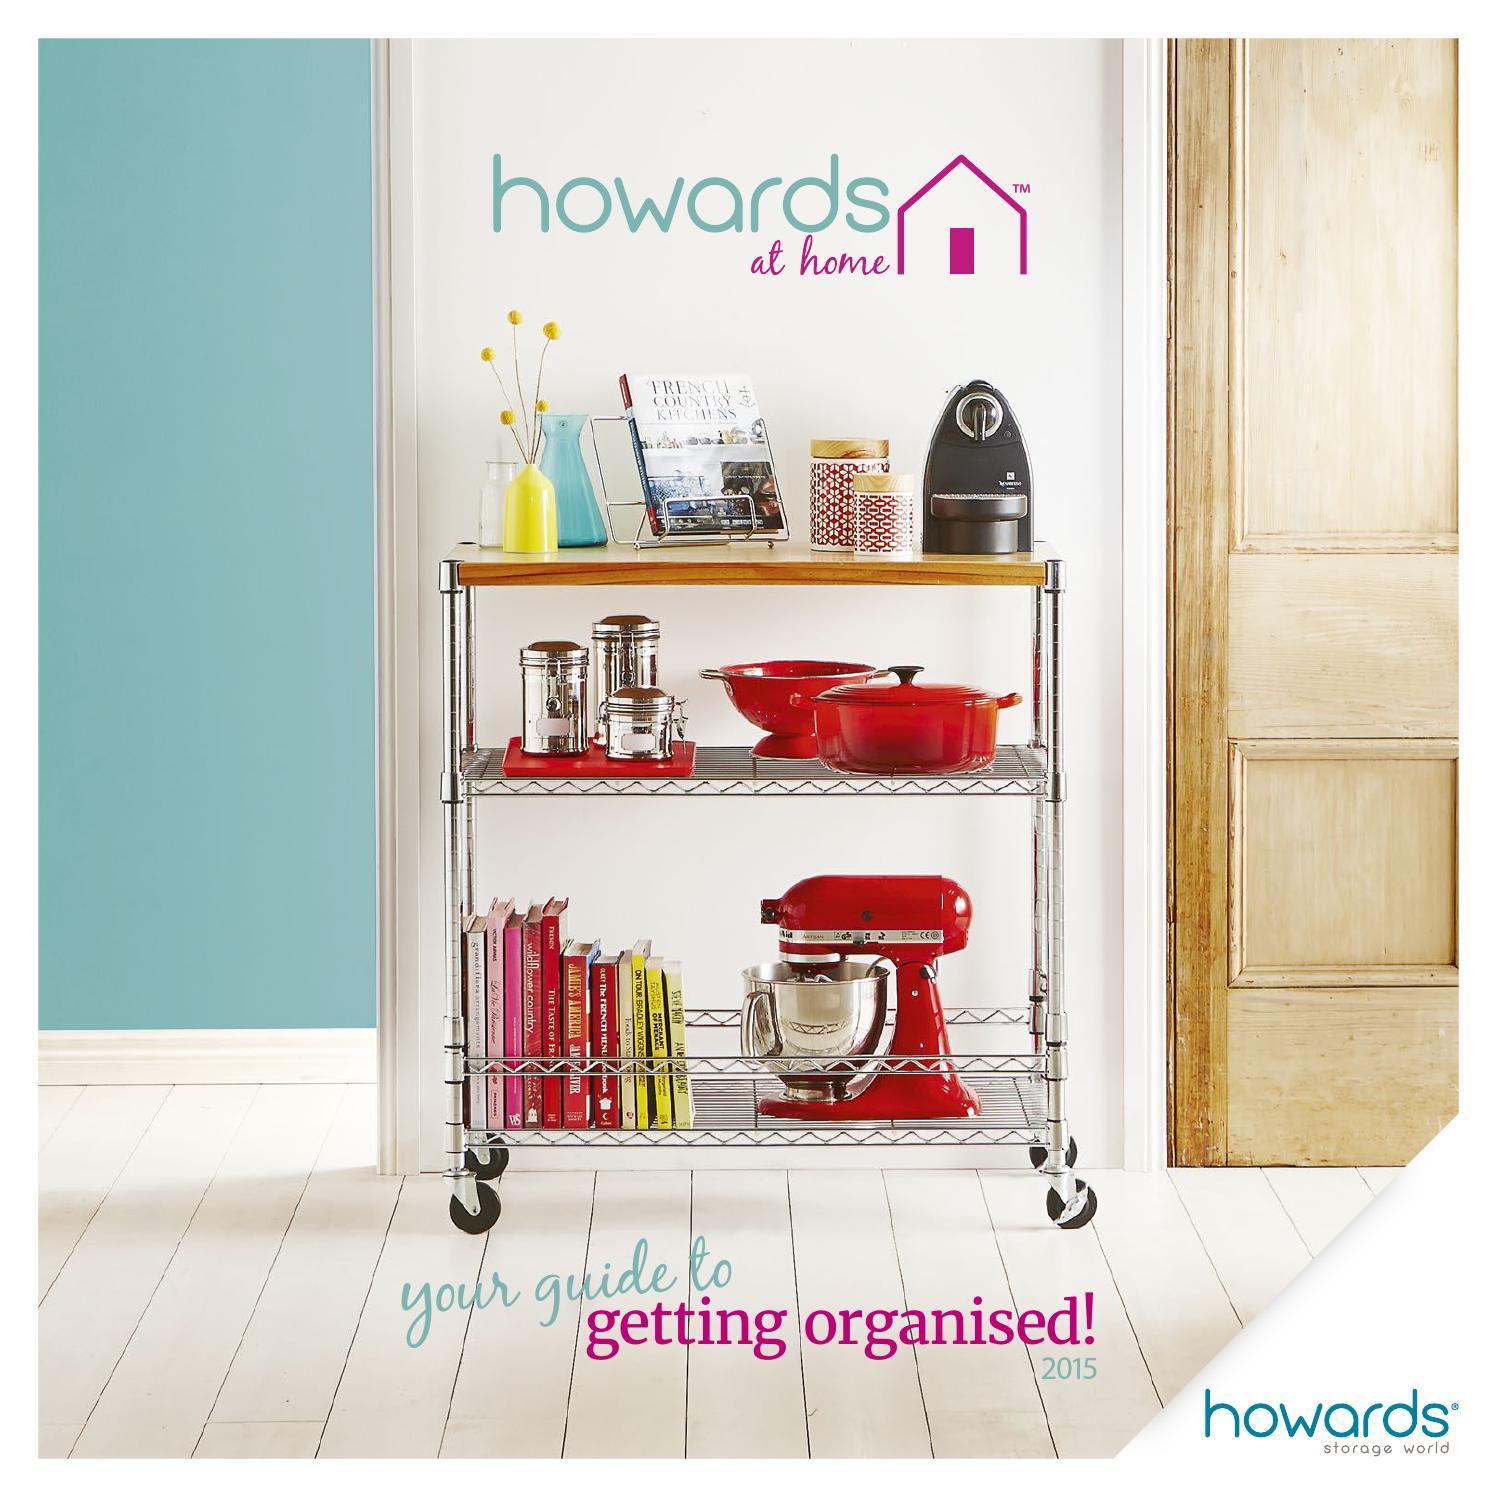 Howards at home by howards storage world aust issuu - Howards storage ...